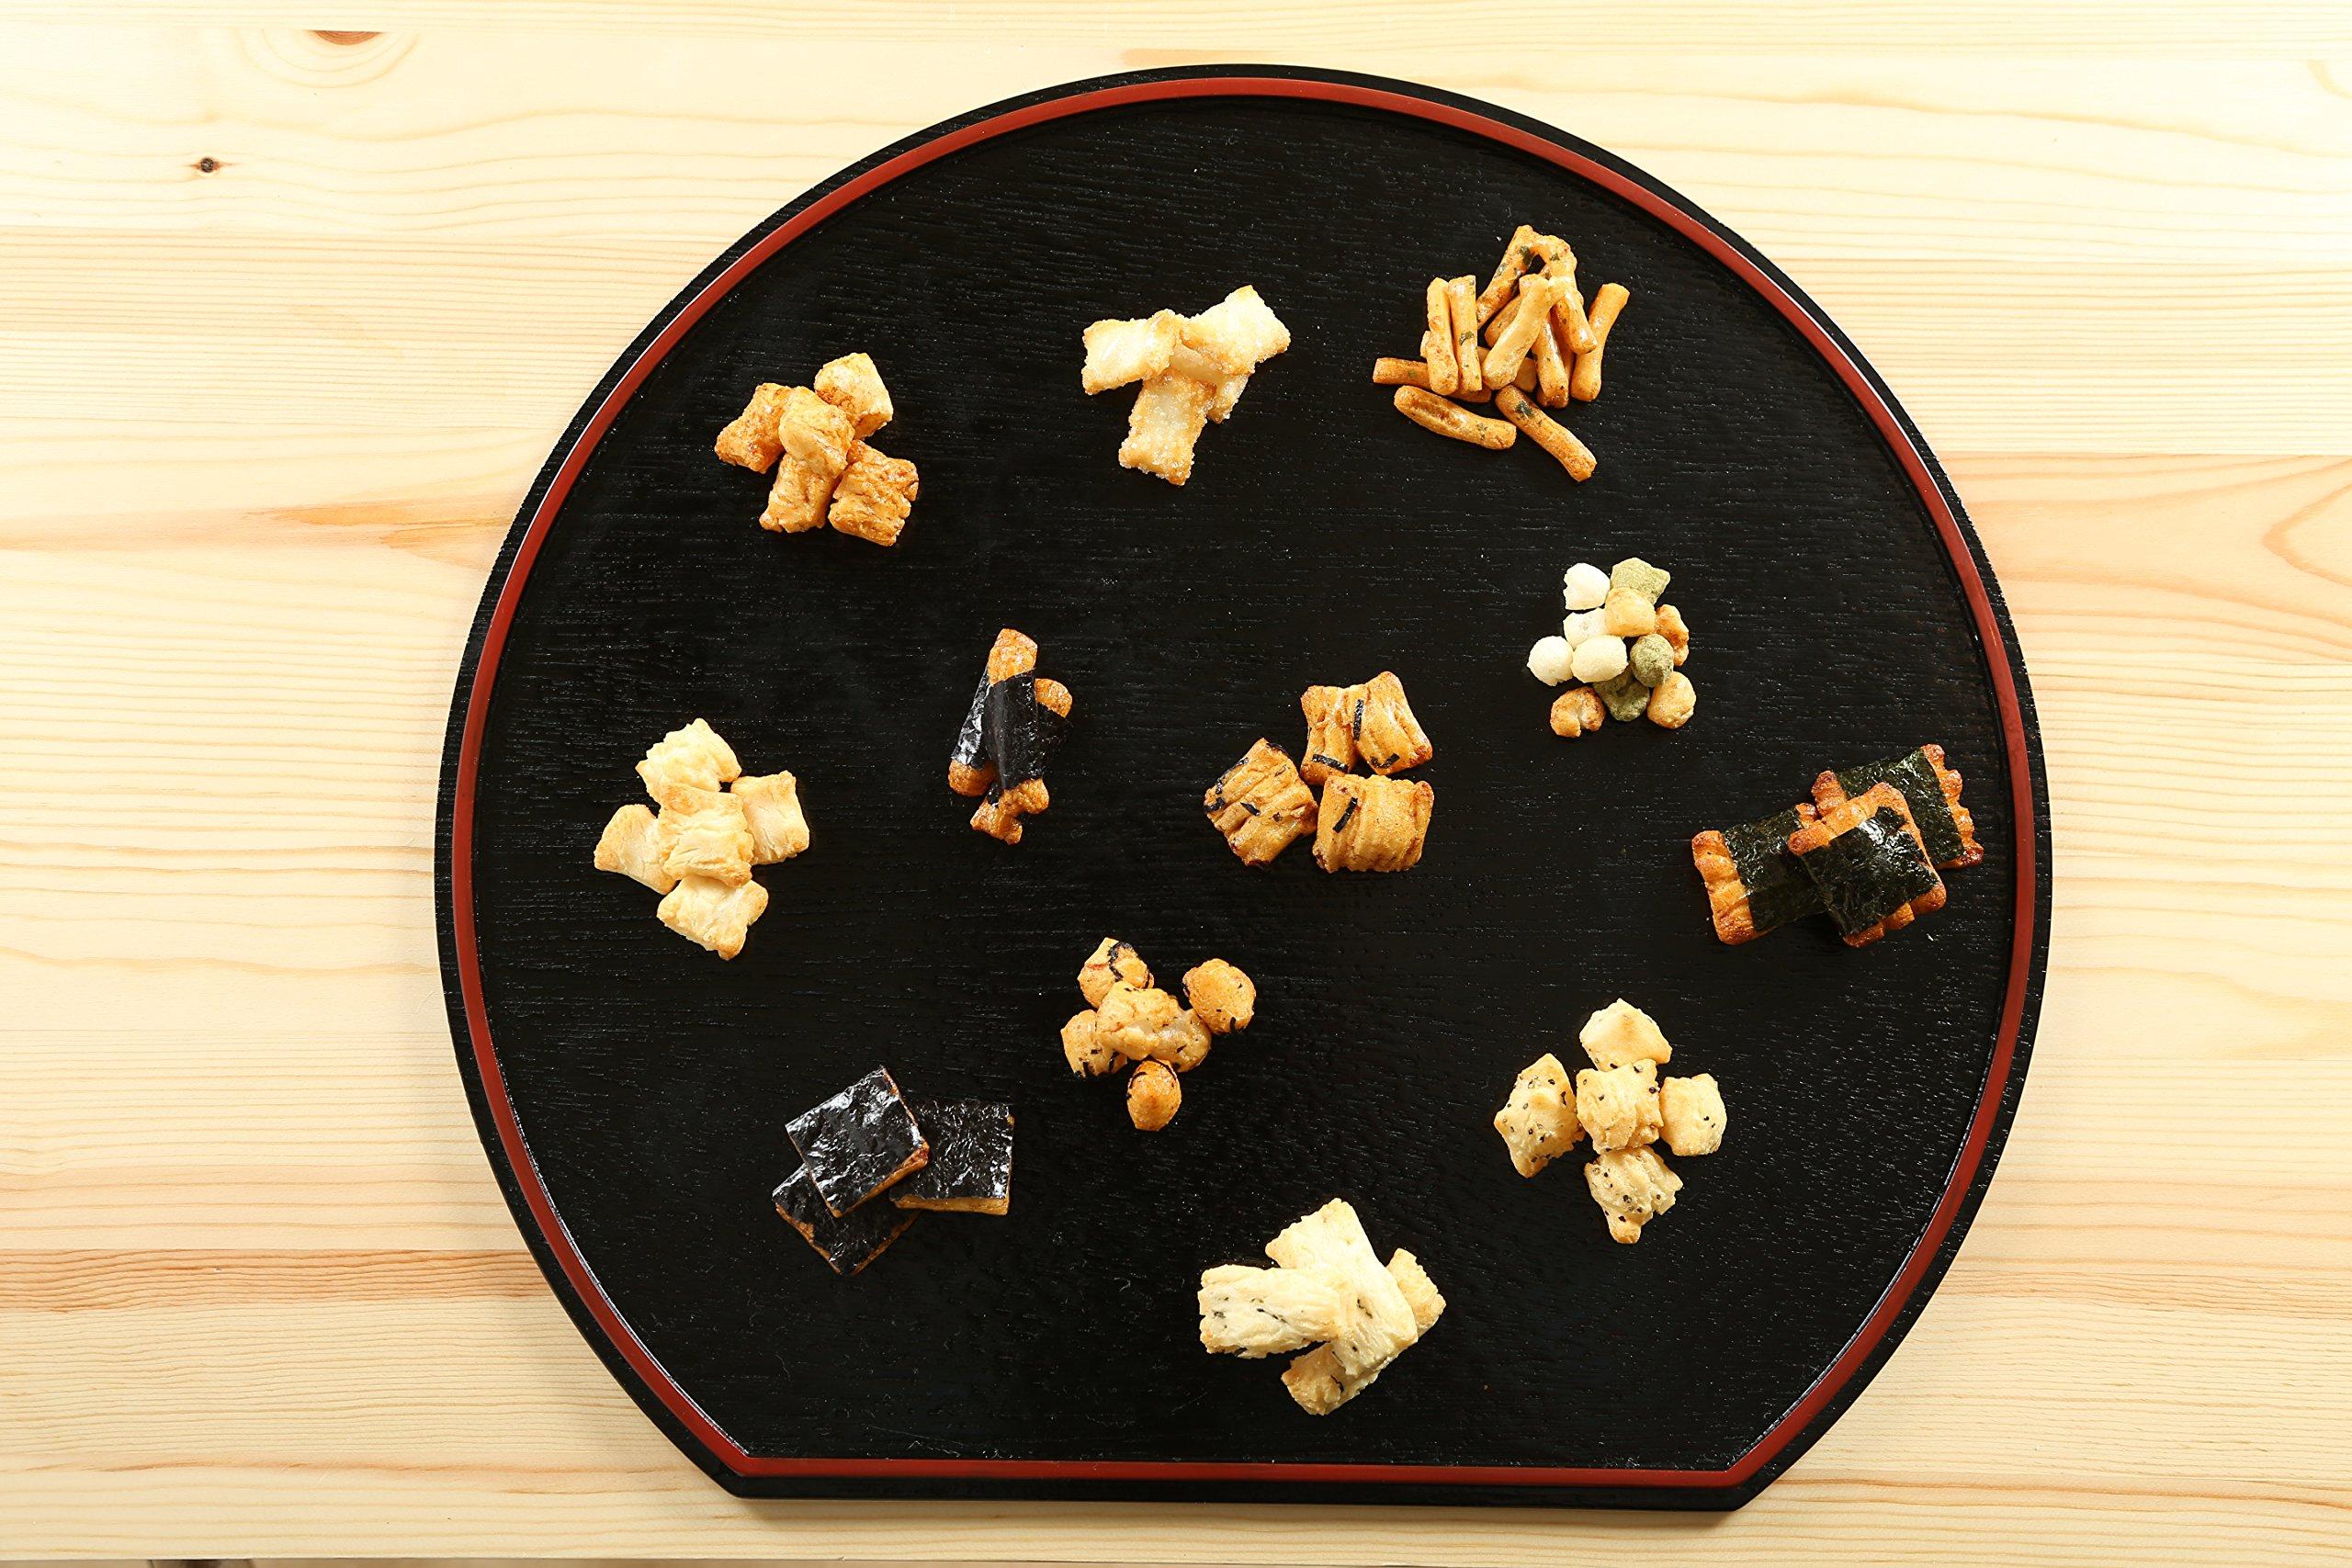 Matsuzaki Senbei Cracker Set - Edo Arare, 8.5oz by Matsuzaki Senbei, est. 1804 (Image #1)